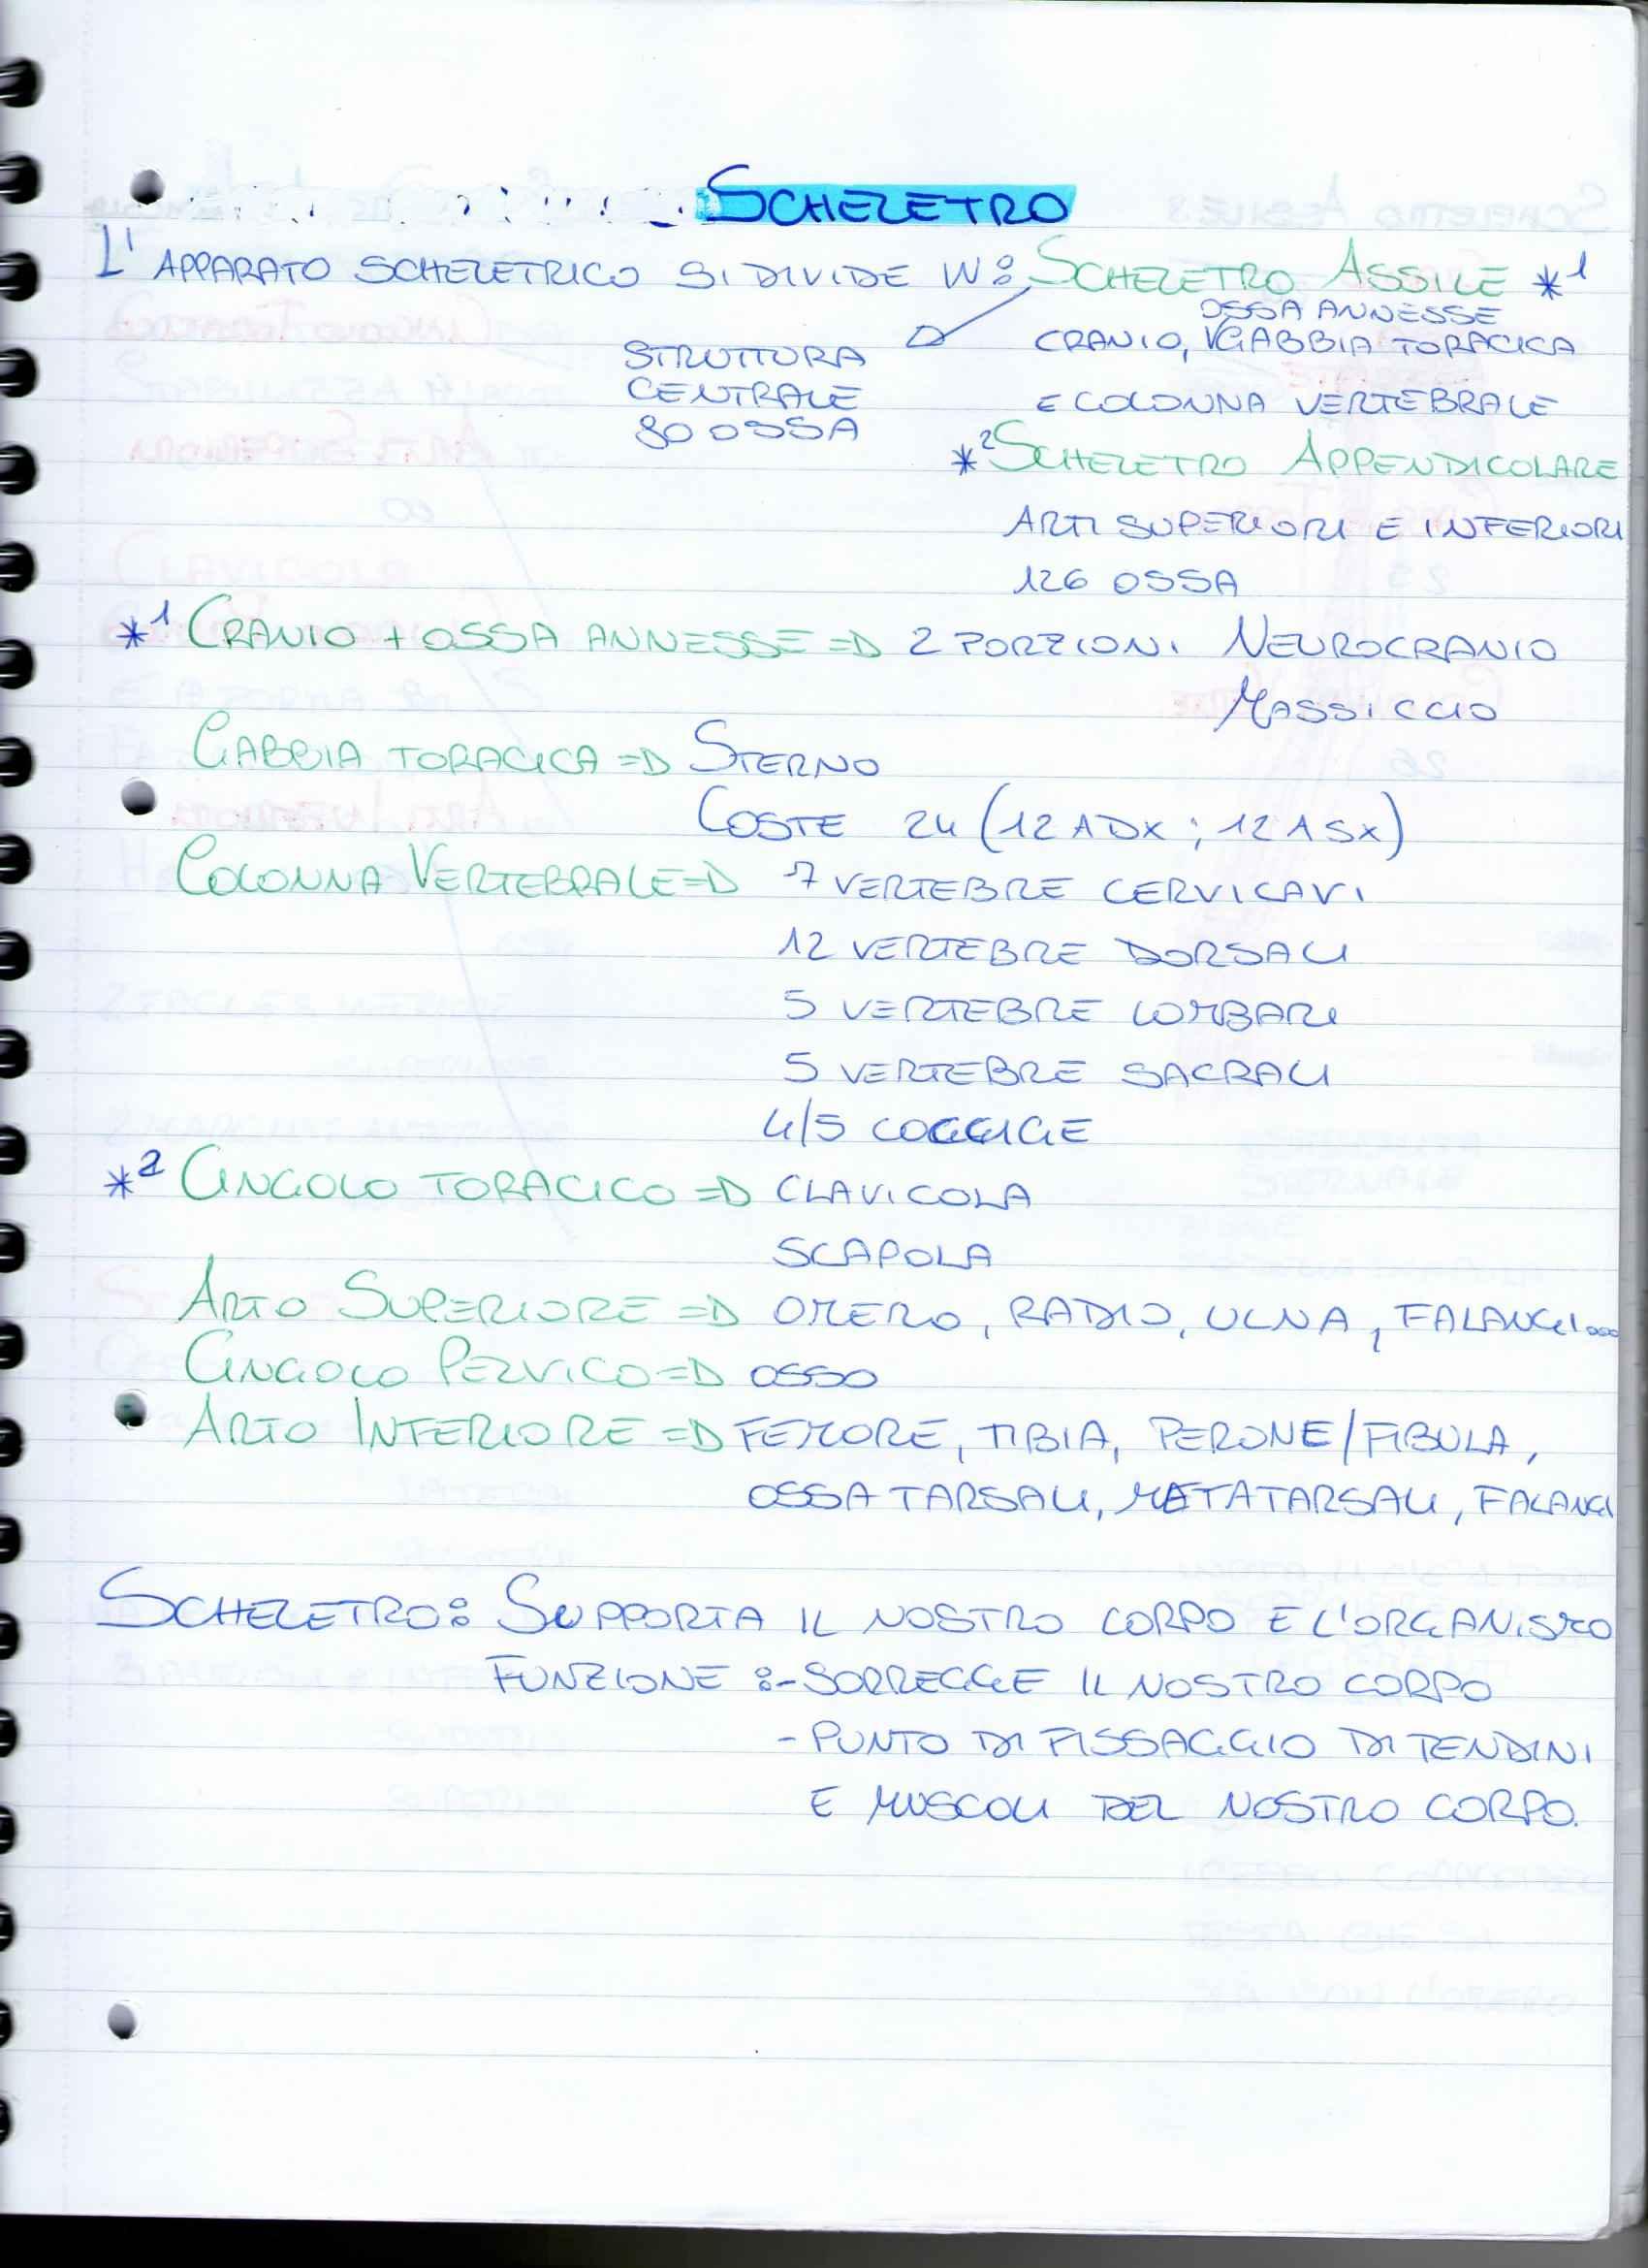 Riassunto esame Anatomia Umana, apparato scheletrico, prof. Ripani, libro consigliato Anatomia umana di Martini, Timmons e Tallitsch